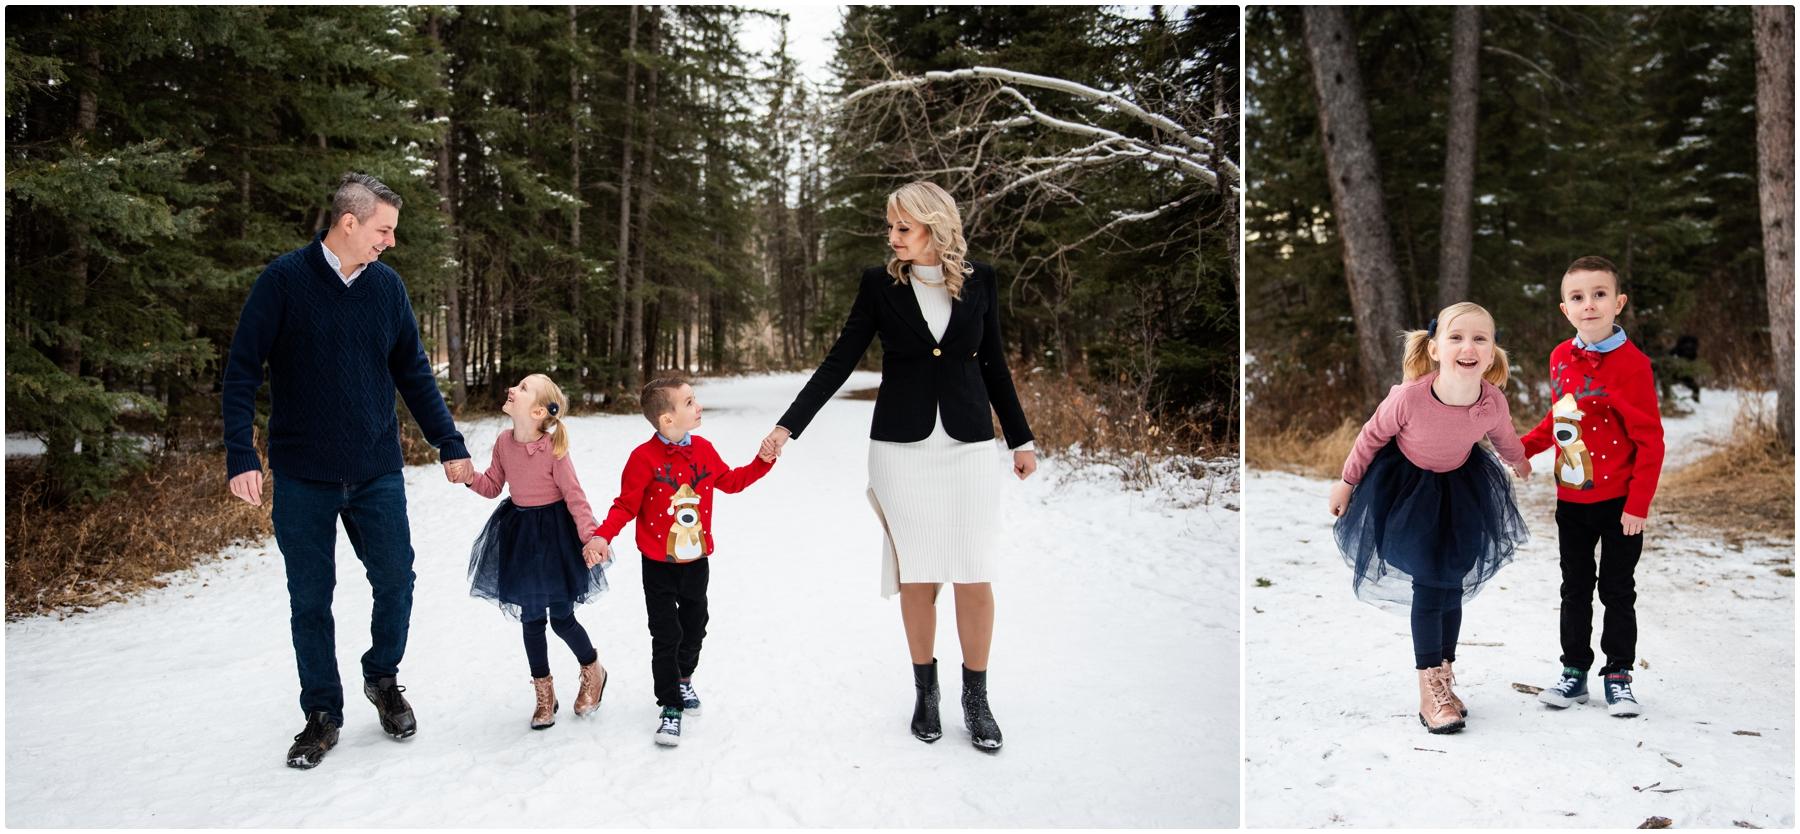 Calgary Alberta Winter Family Photos - Bebo Grove